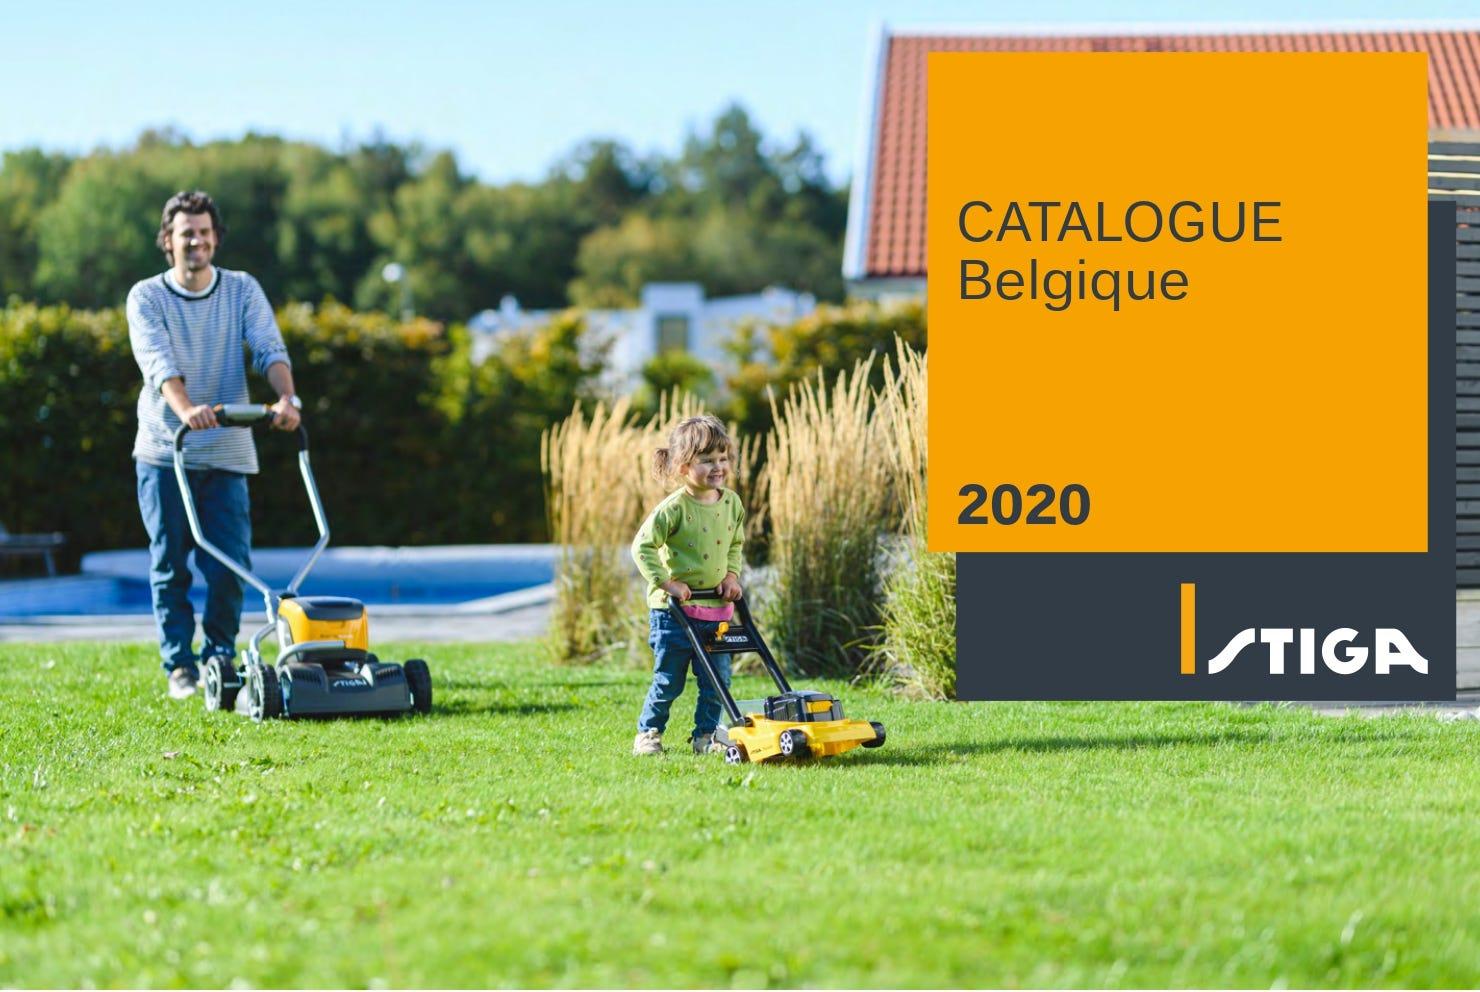 catalogue-stiga-2020-belgique